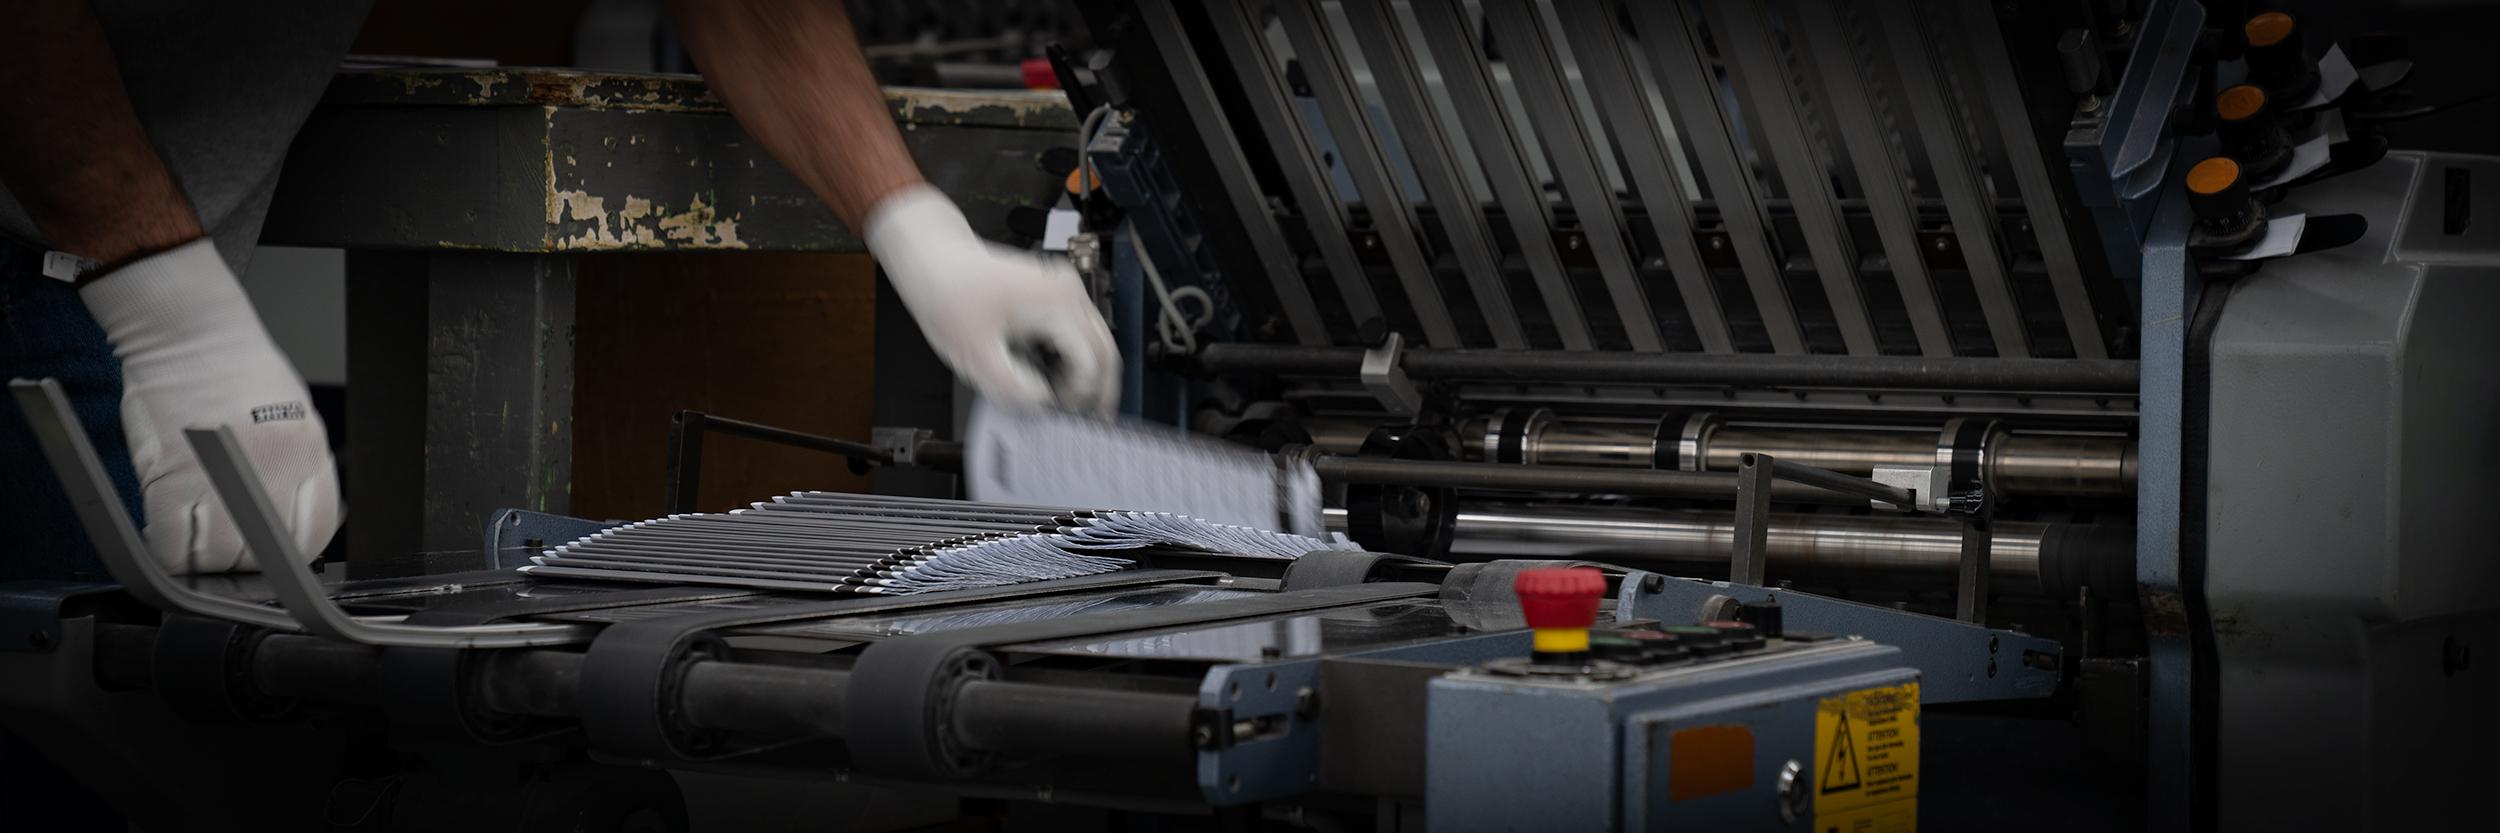 World Arts Printing Team